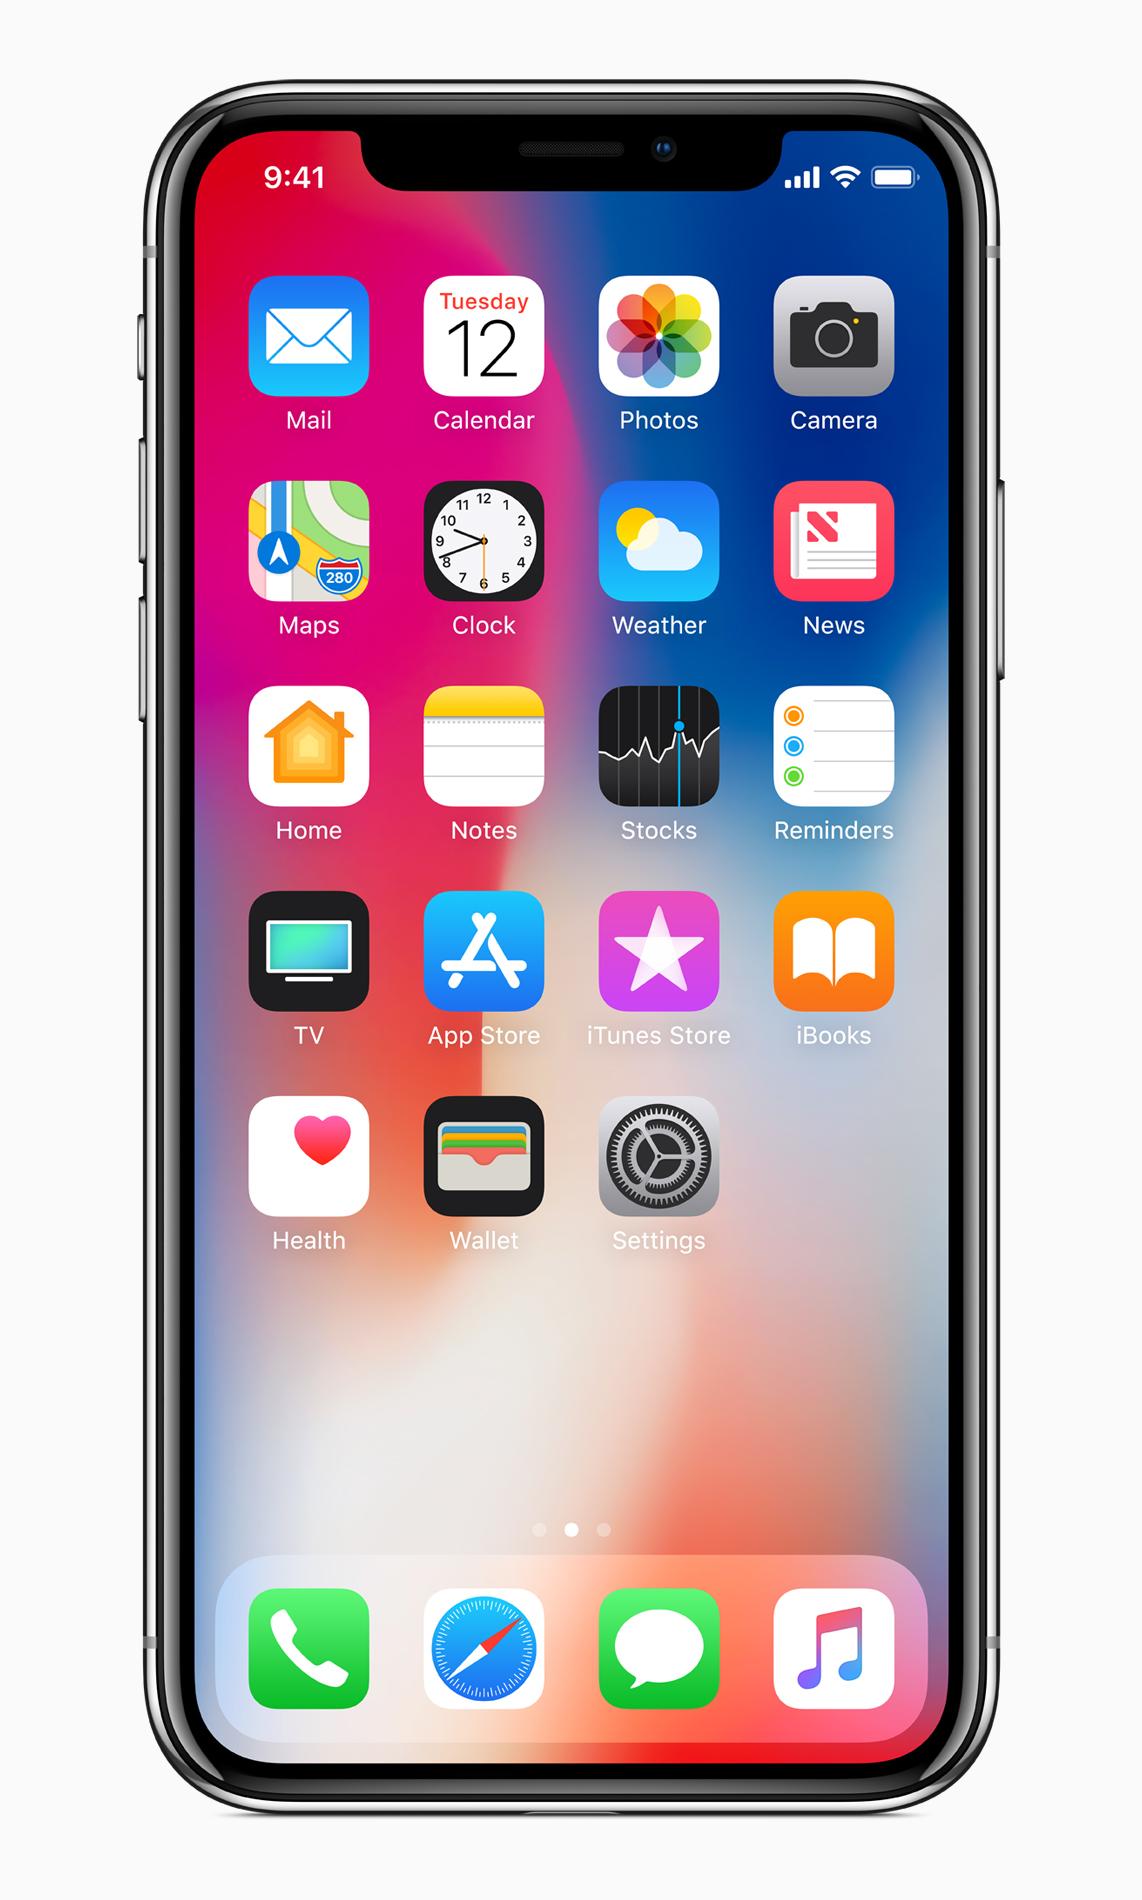 Statusbar auf dem iPhone X, Hack4Life, Fabian Geissler, Batterieladung in %, Tipp, How To